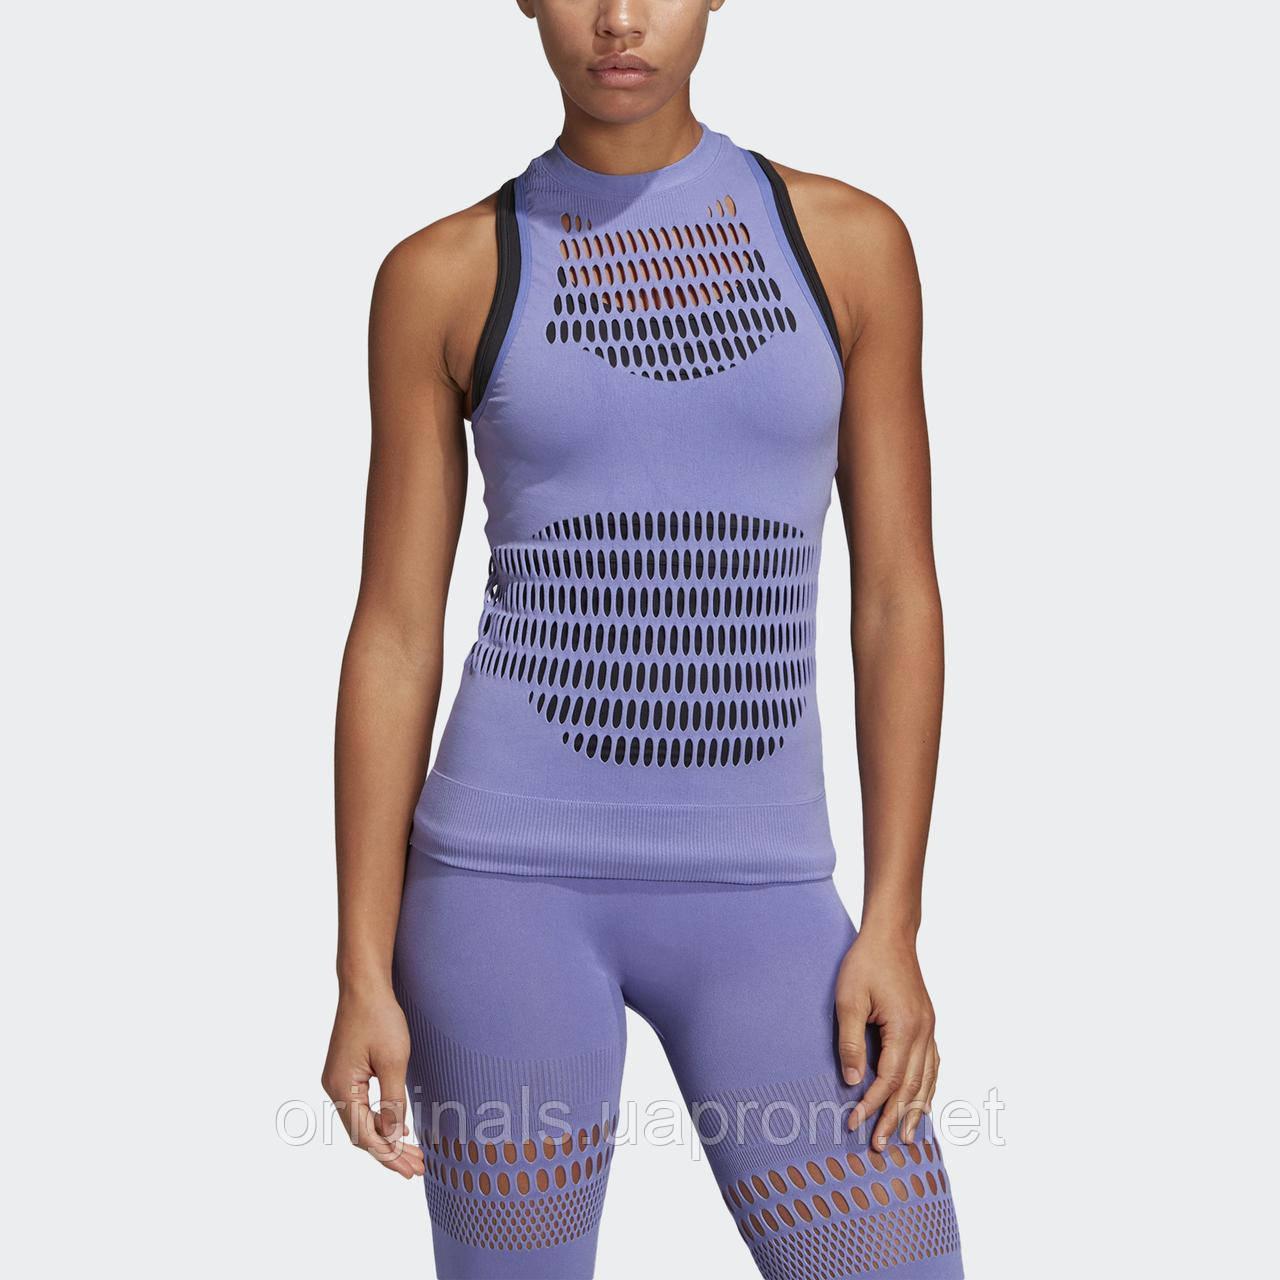 Спортивная майка Adidas Warp Knit DQ0579